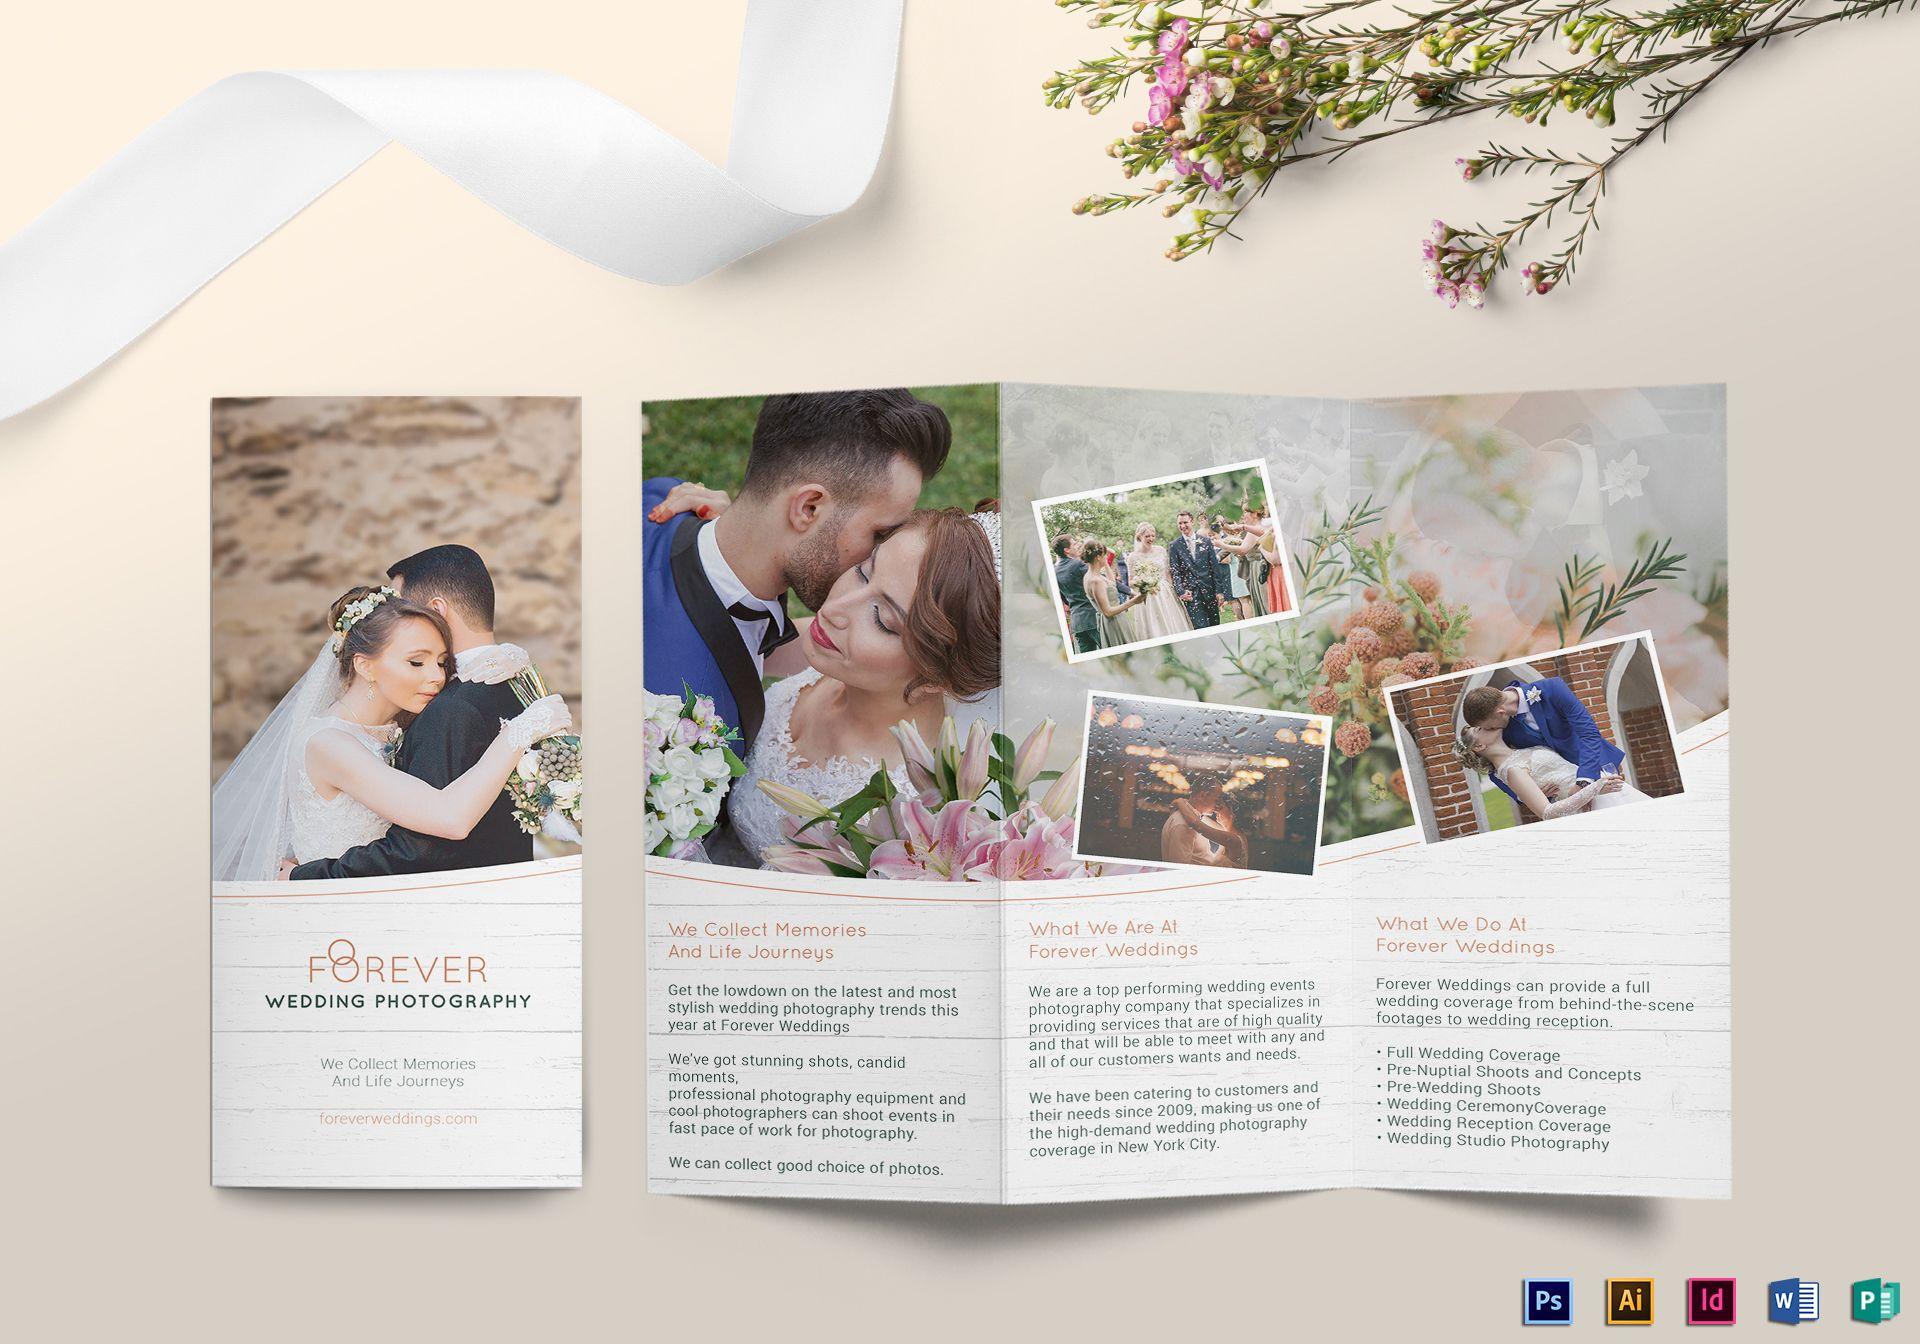 forever trifold wedding brochure design